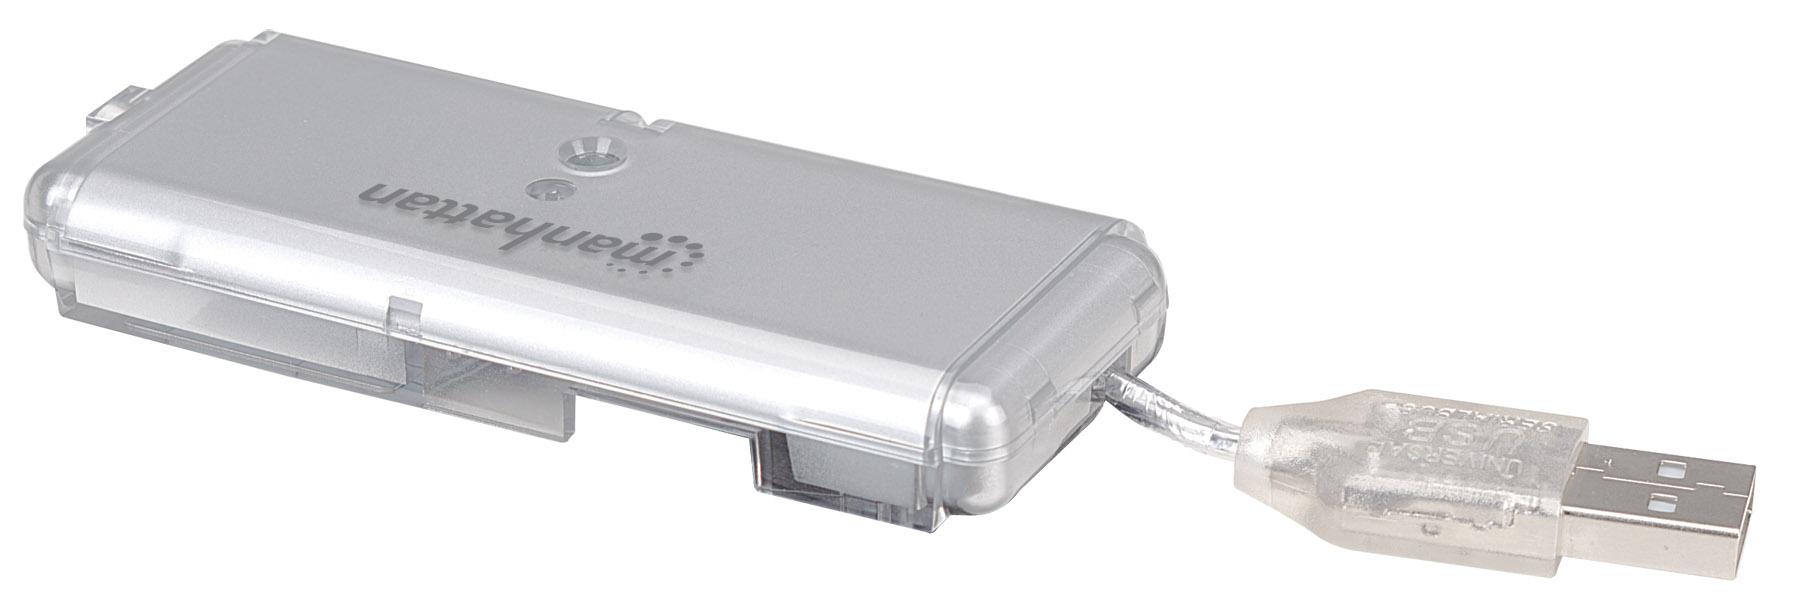 Hi-Speed USB Pocket Hub